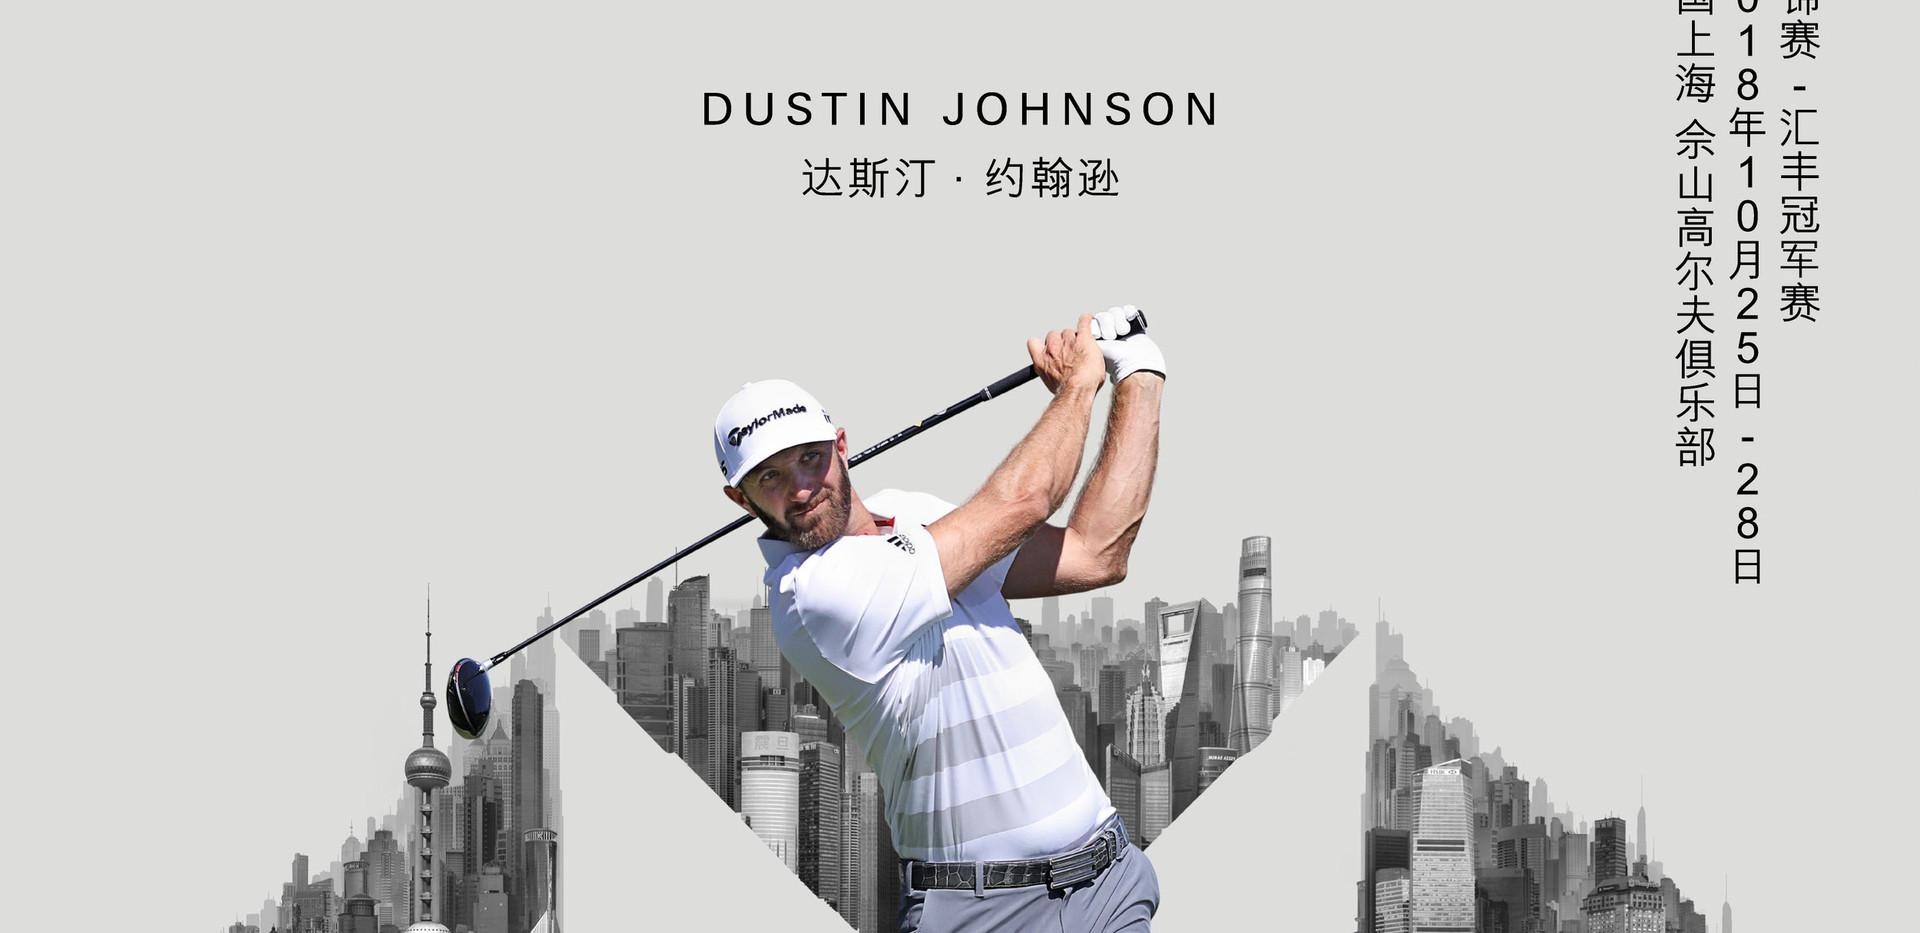 0117_HSBC_China_Golf_6sheet_DUSTIN-2(1)